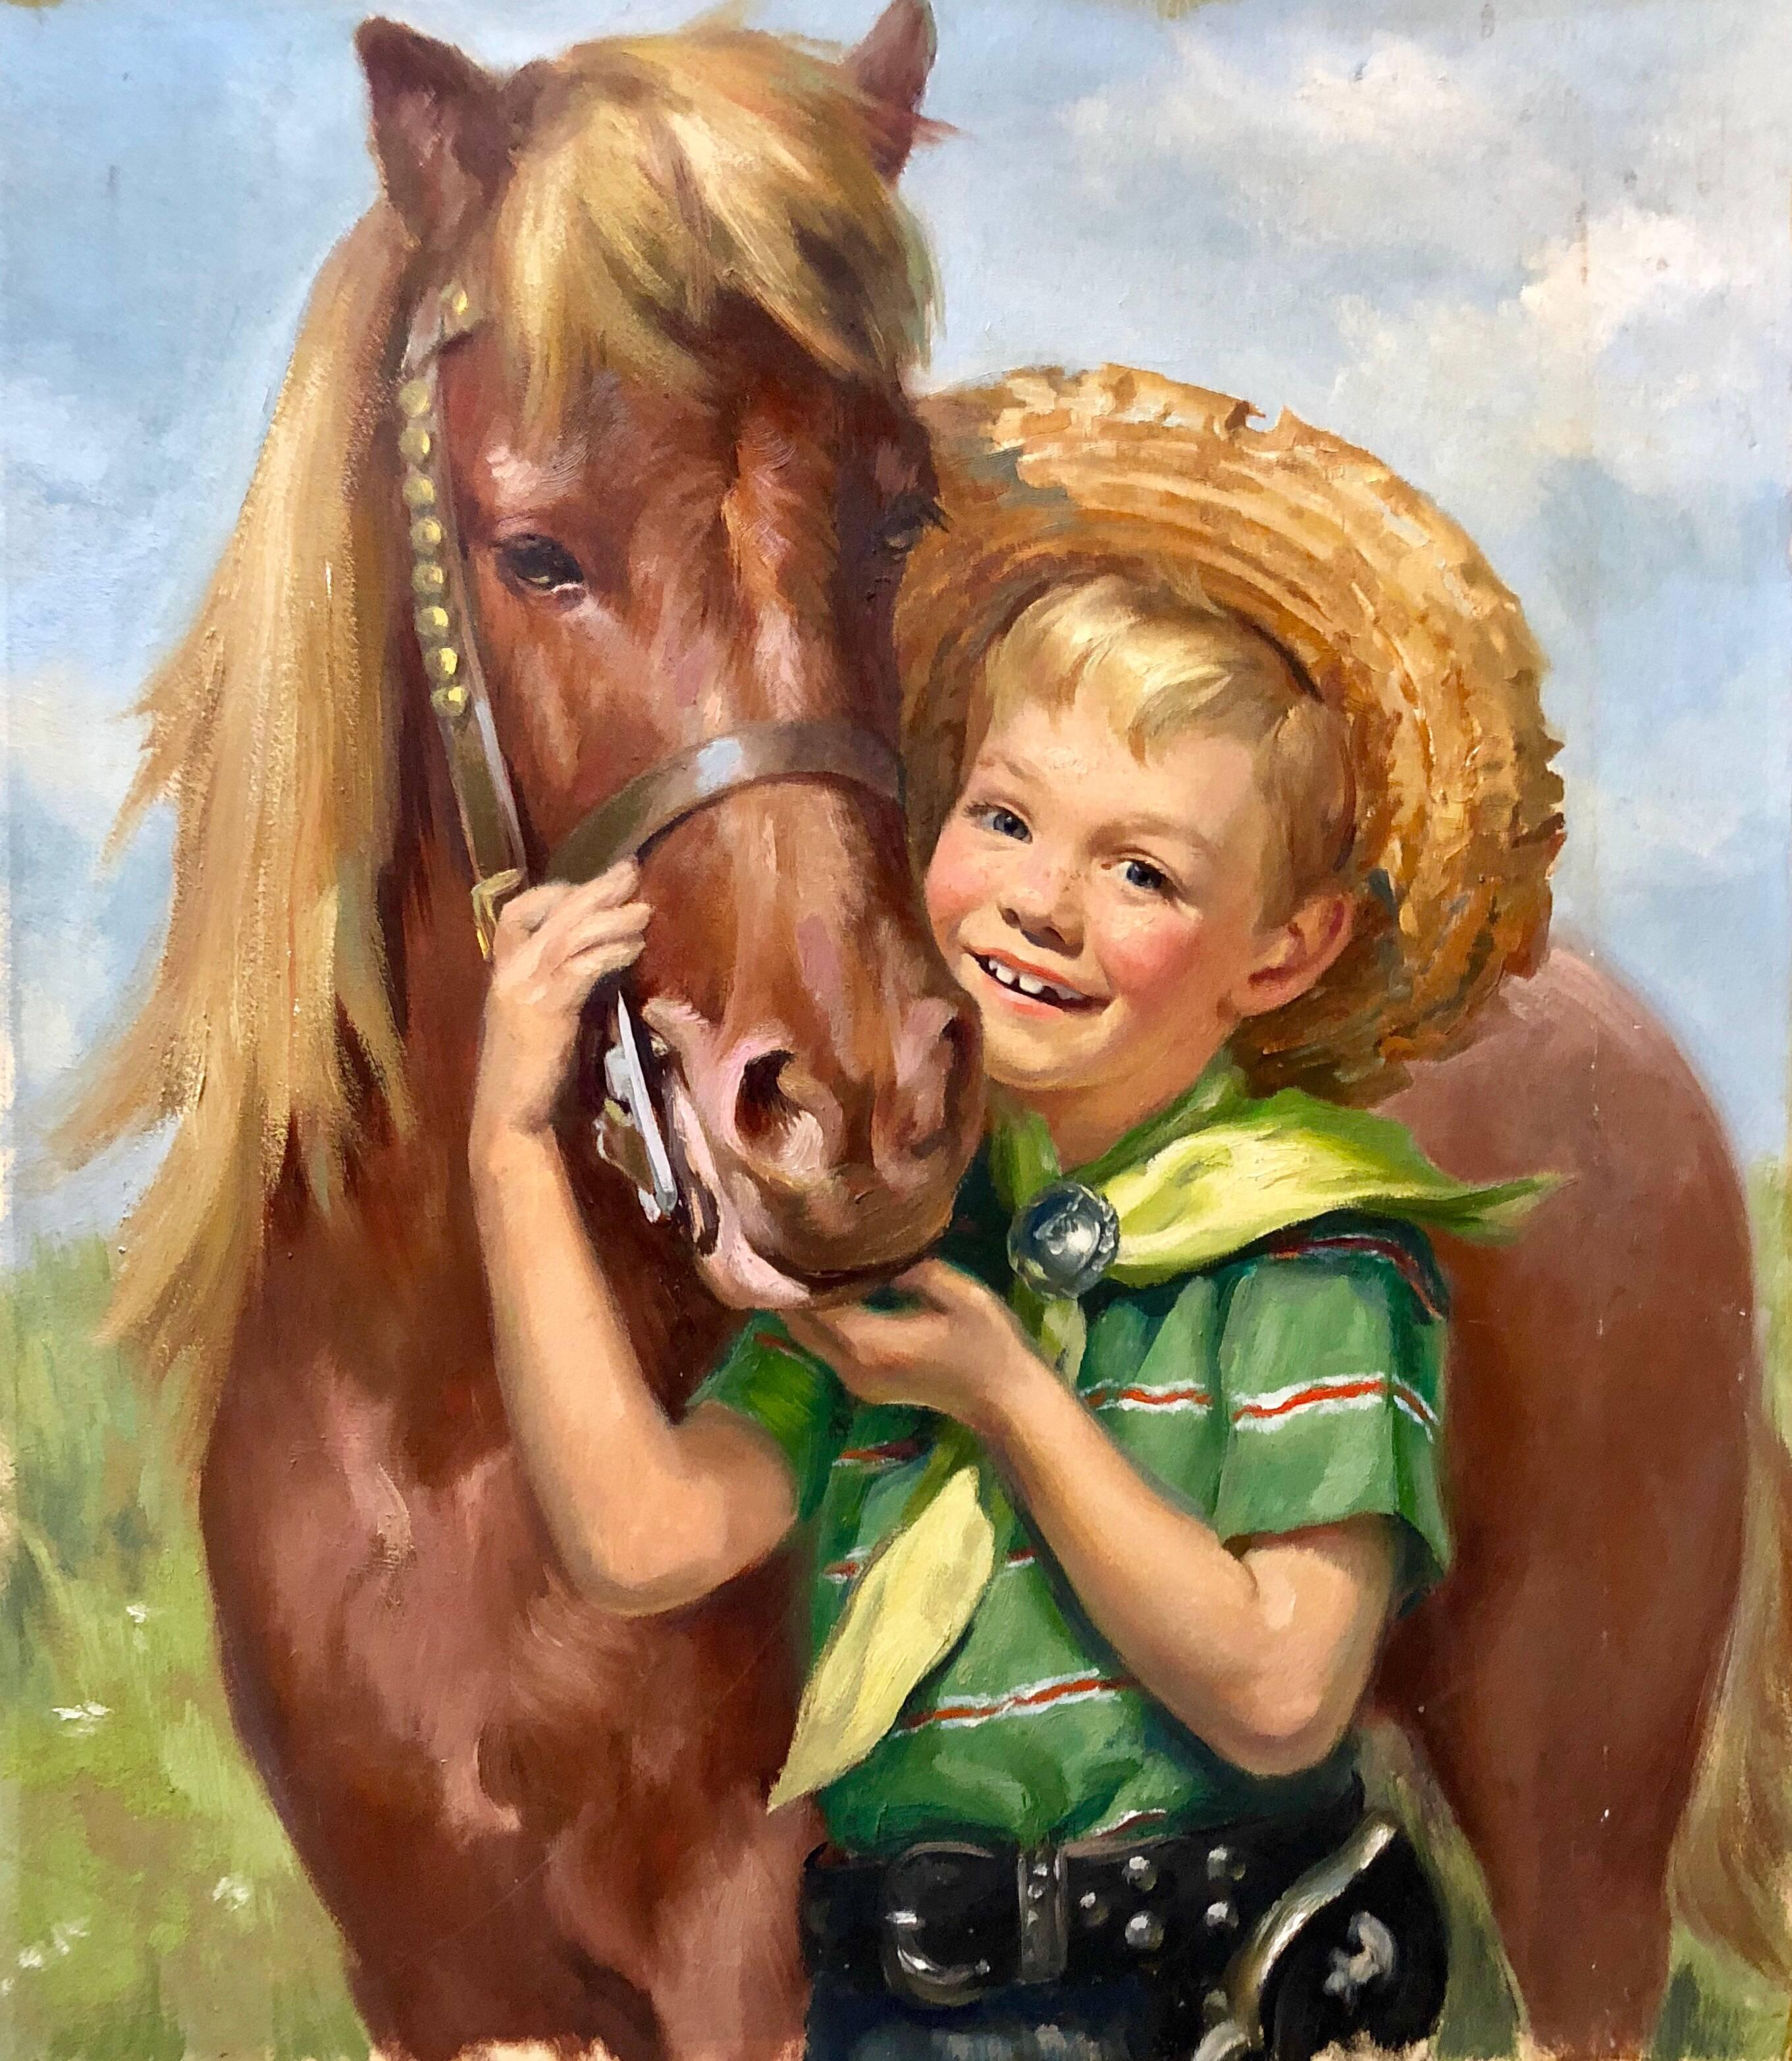 Original Vintage Illustration Boy with Horse Oil Painting Americana